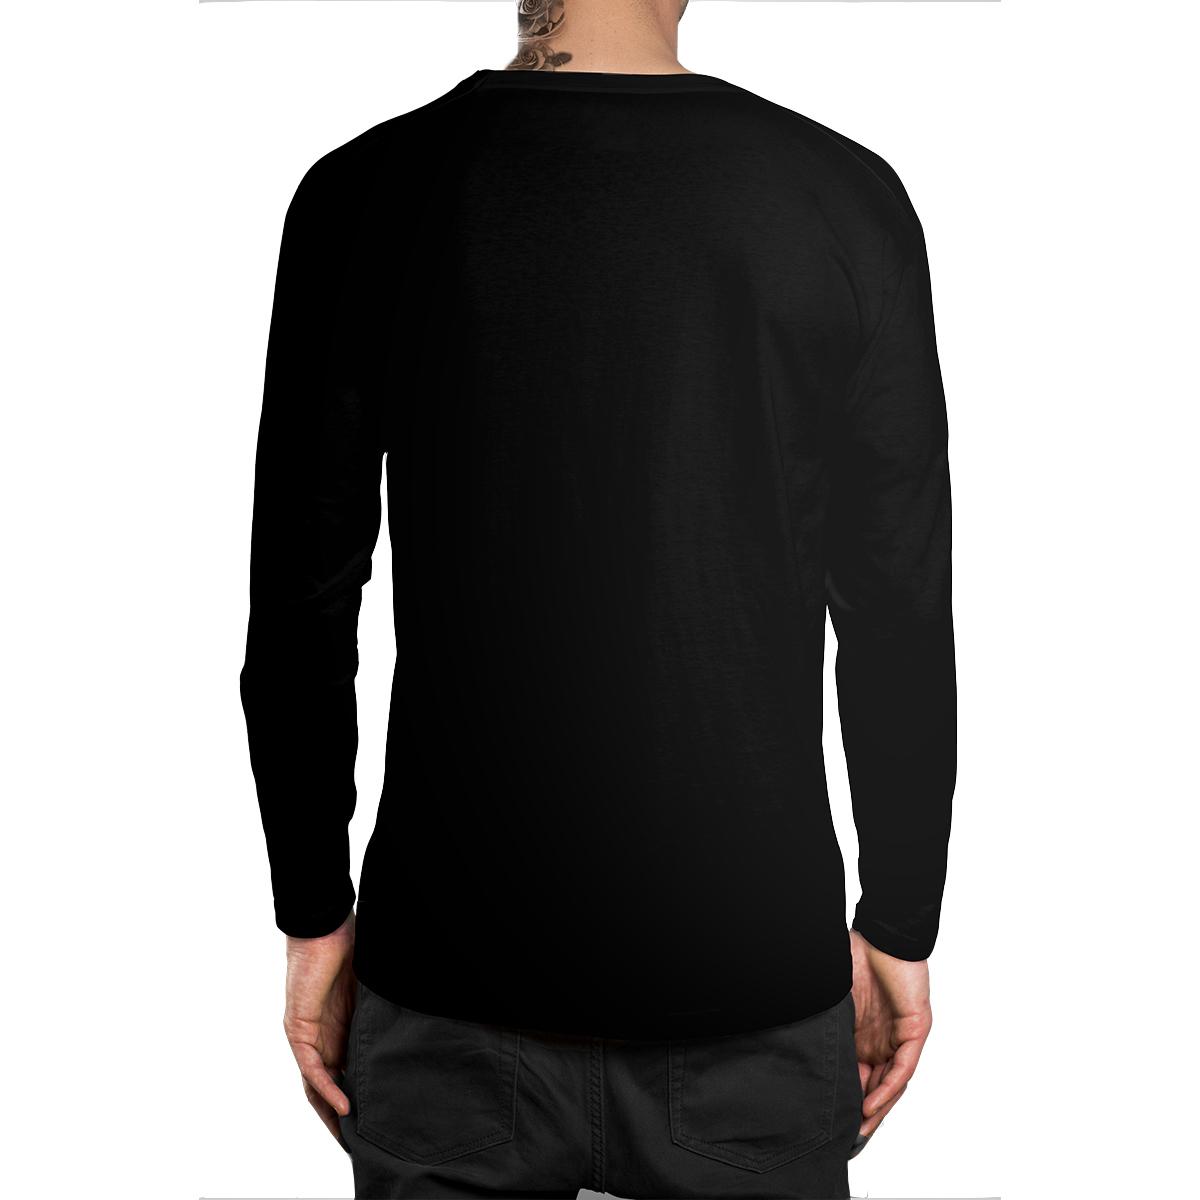 Stompy Camiseta Manga Longa Modelo 16